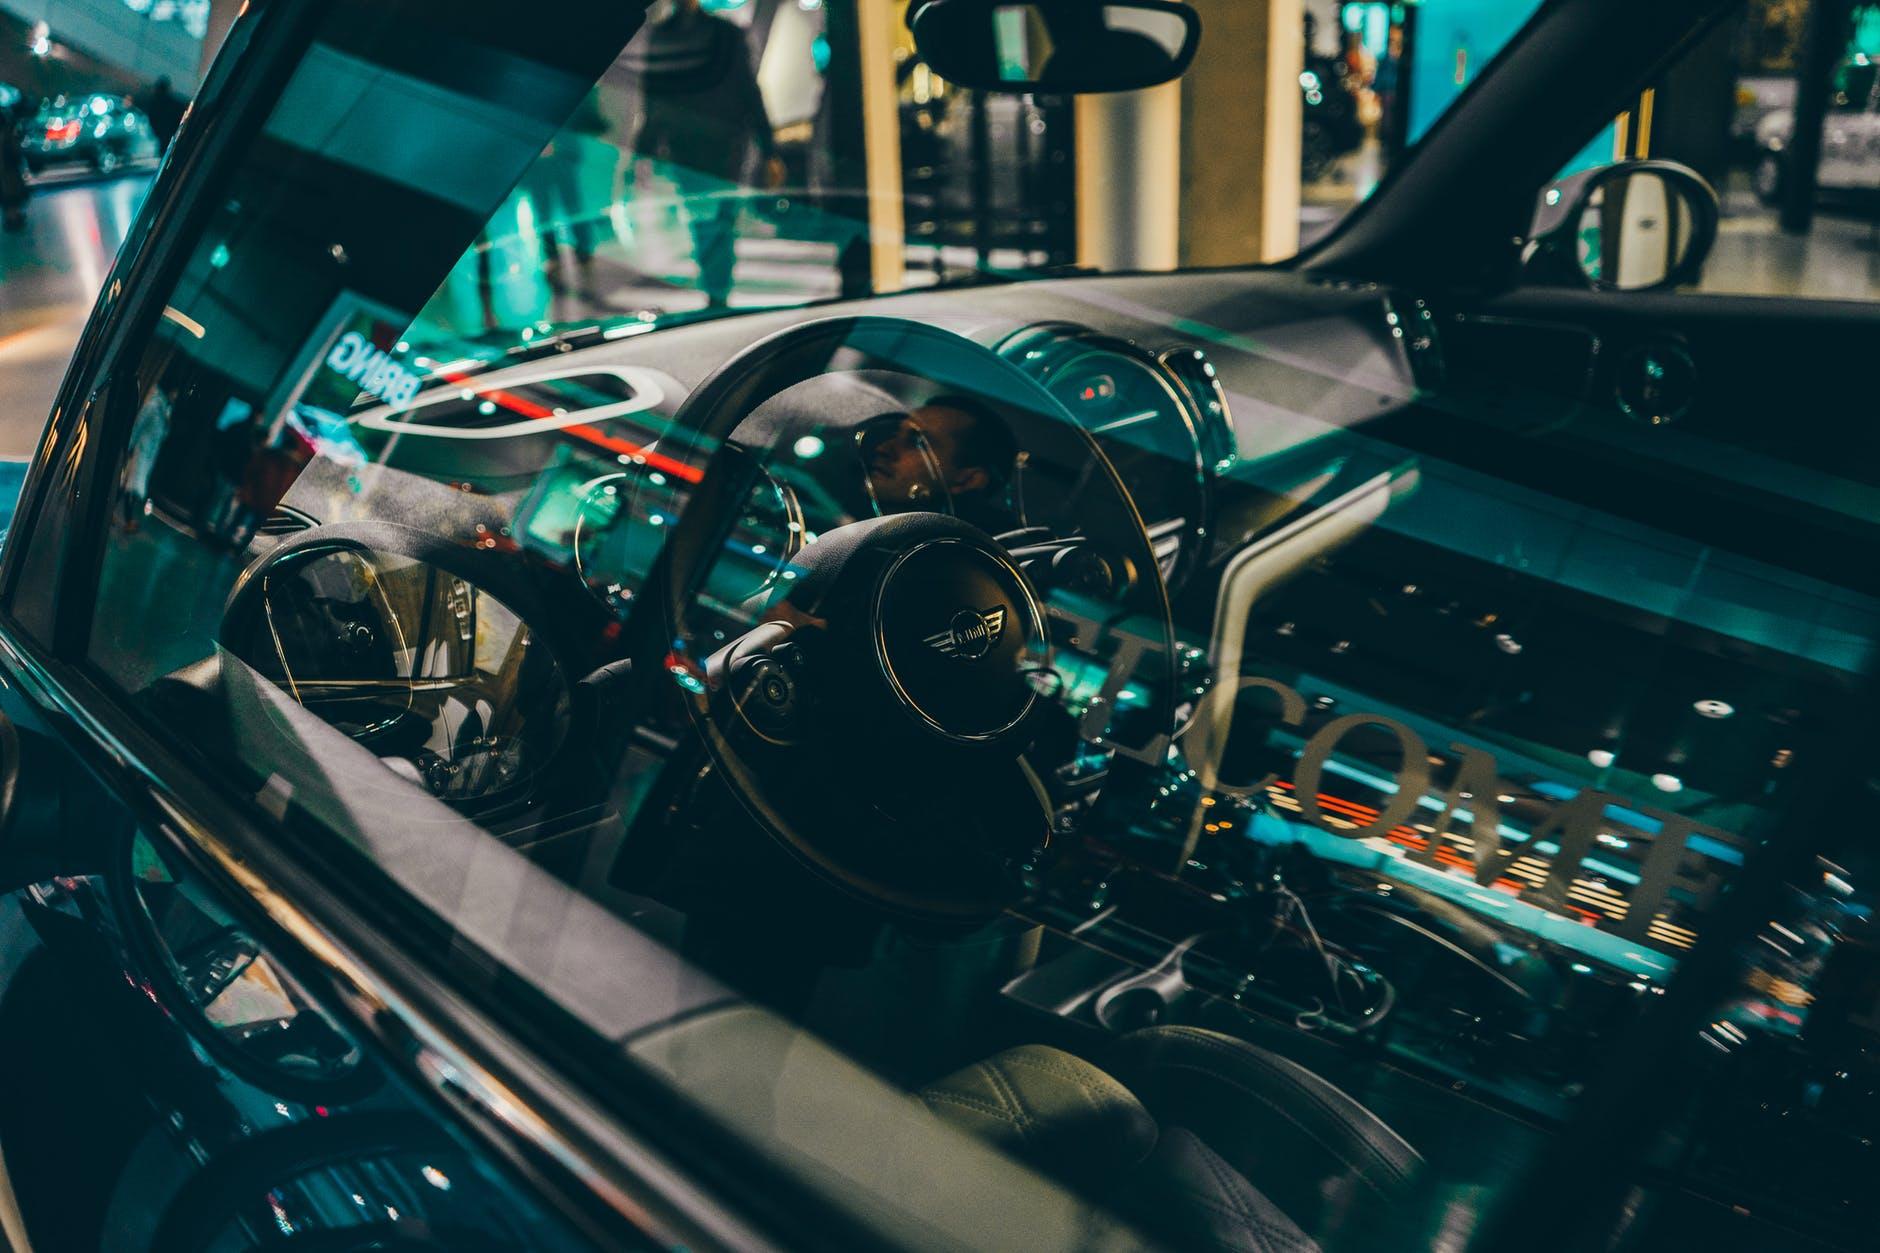 A Leading Automotive Component Manufacturer Chooses Managed SAP HANA Hosting on Progression Cloud